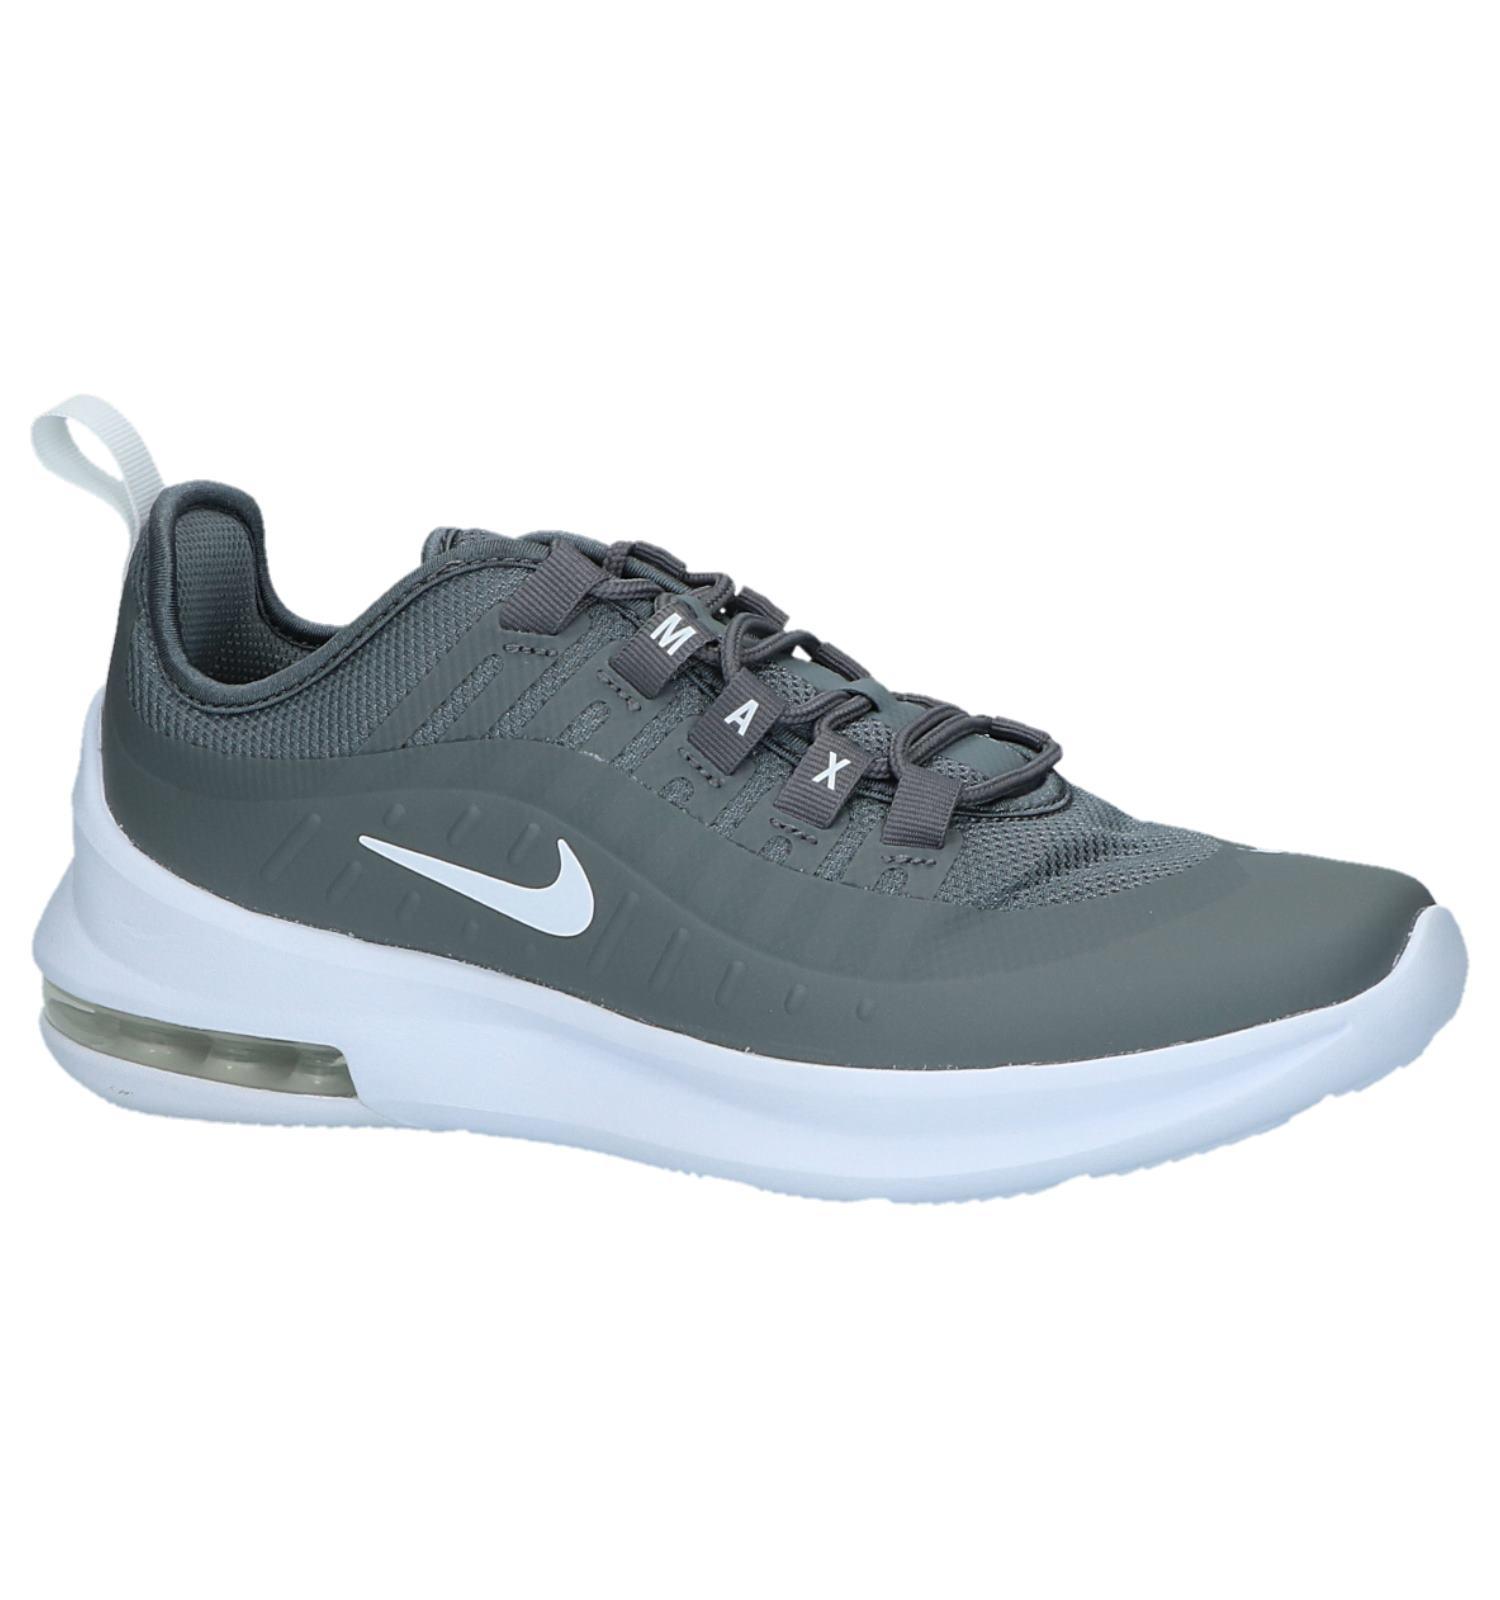 1143cf8ea25 Grijze Nike Air Max Millenial Sneakers   TORFS.BE   Gratis verzend en retour